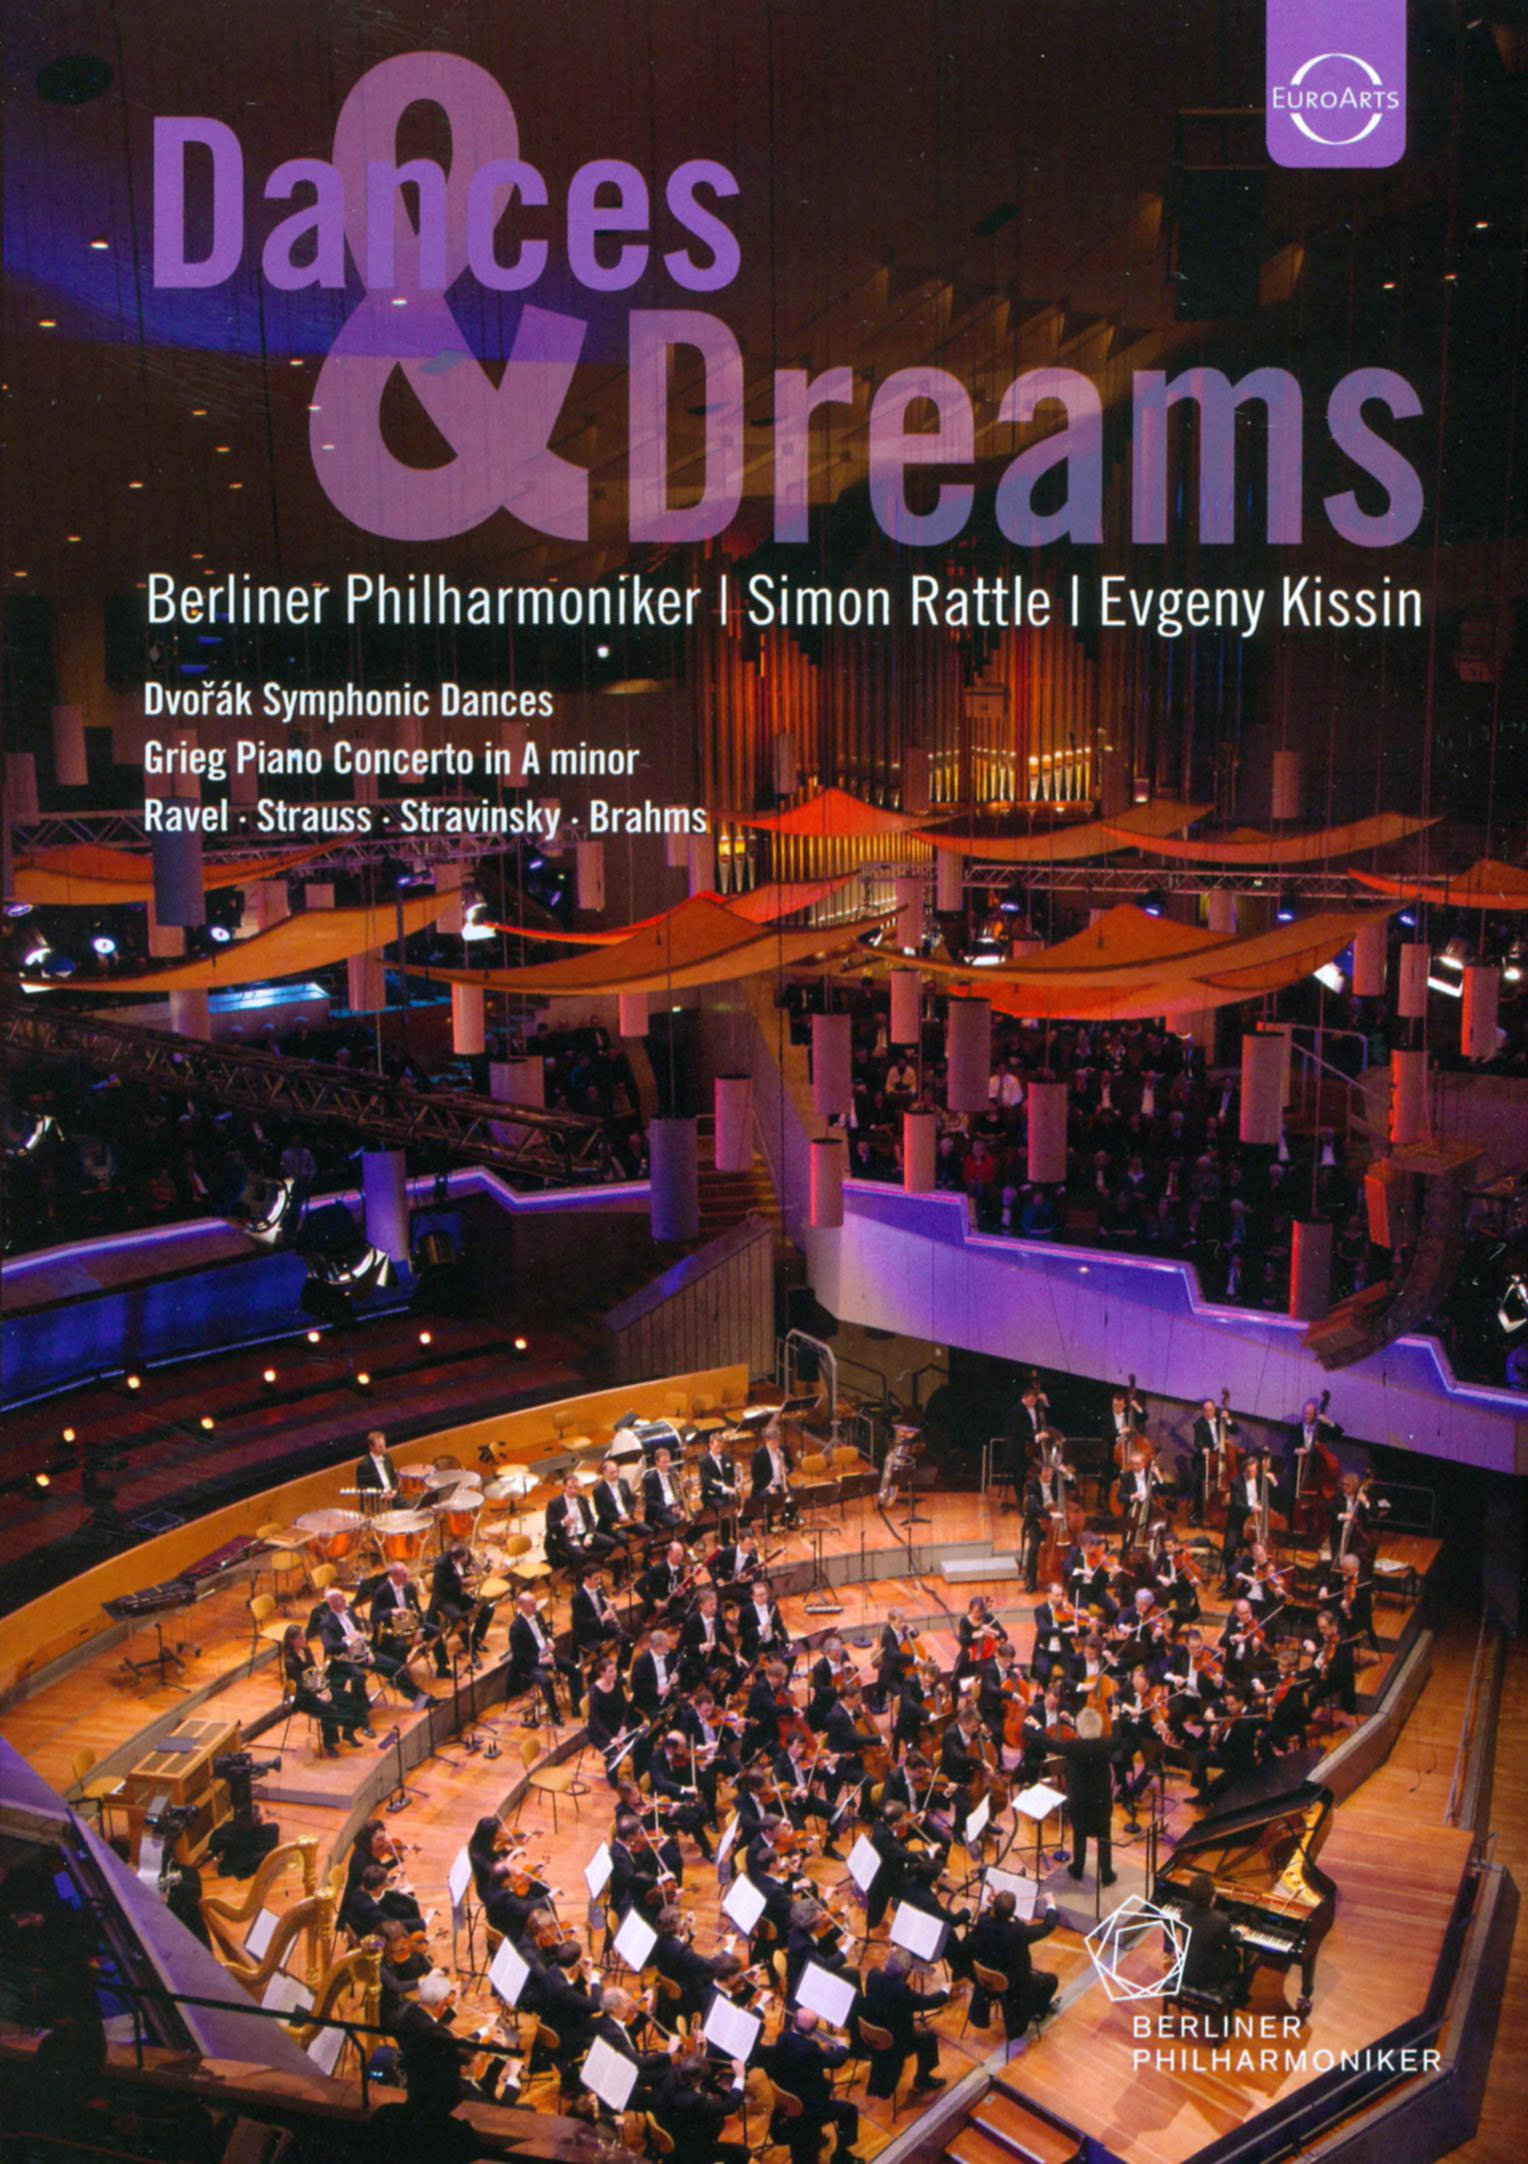 Berliner Philharmoniker/Simon Rattle/Evgeny Kissin: Dances & Dreams